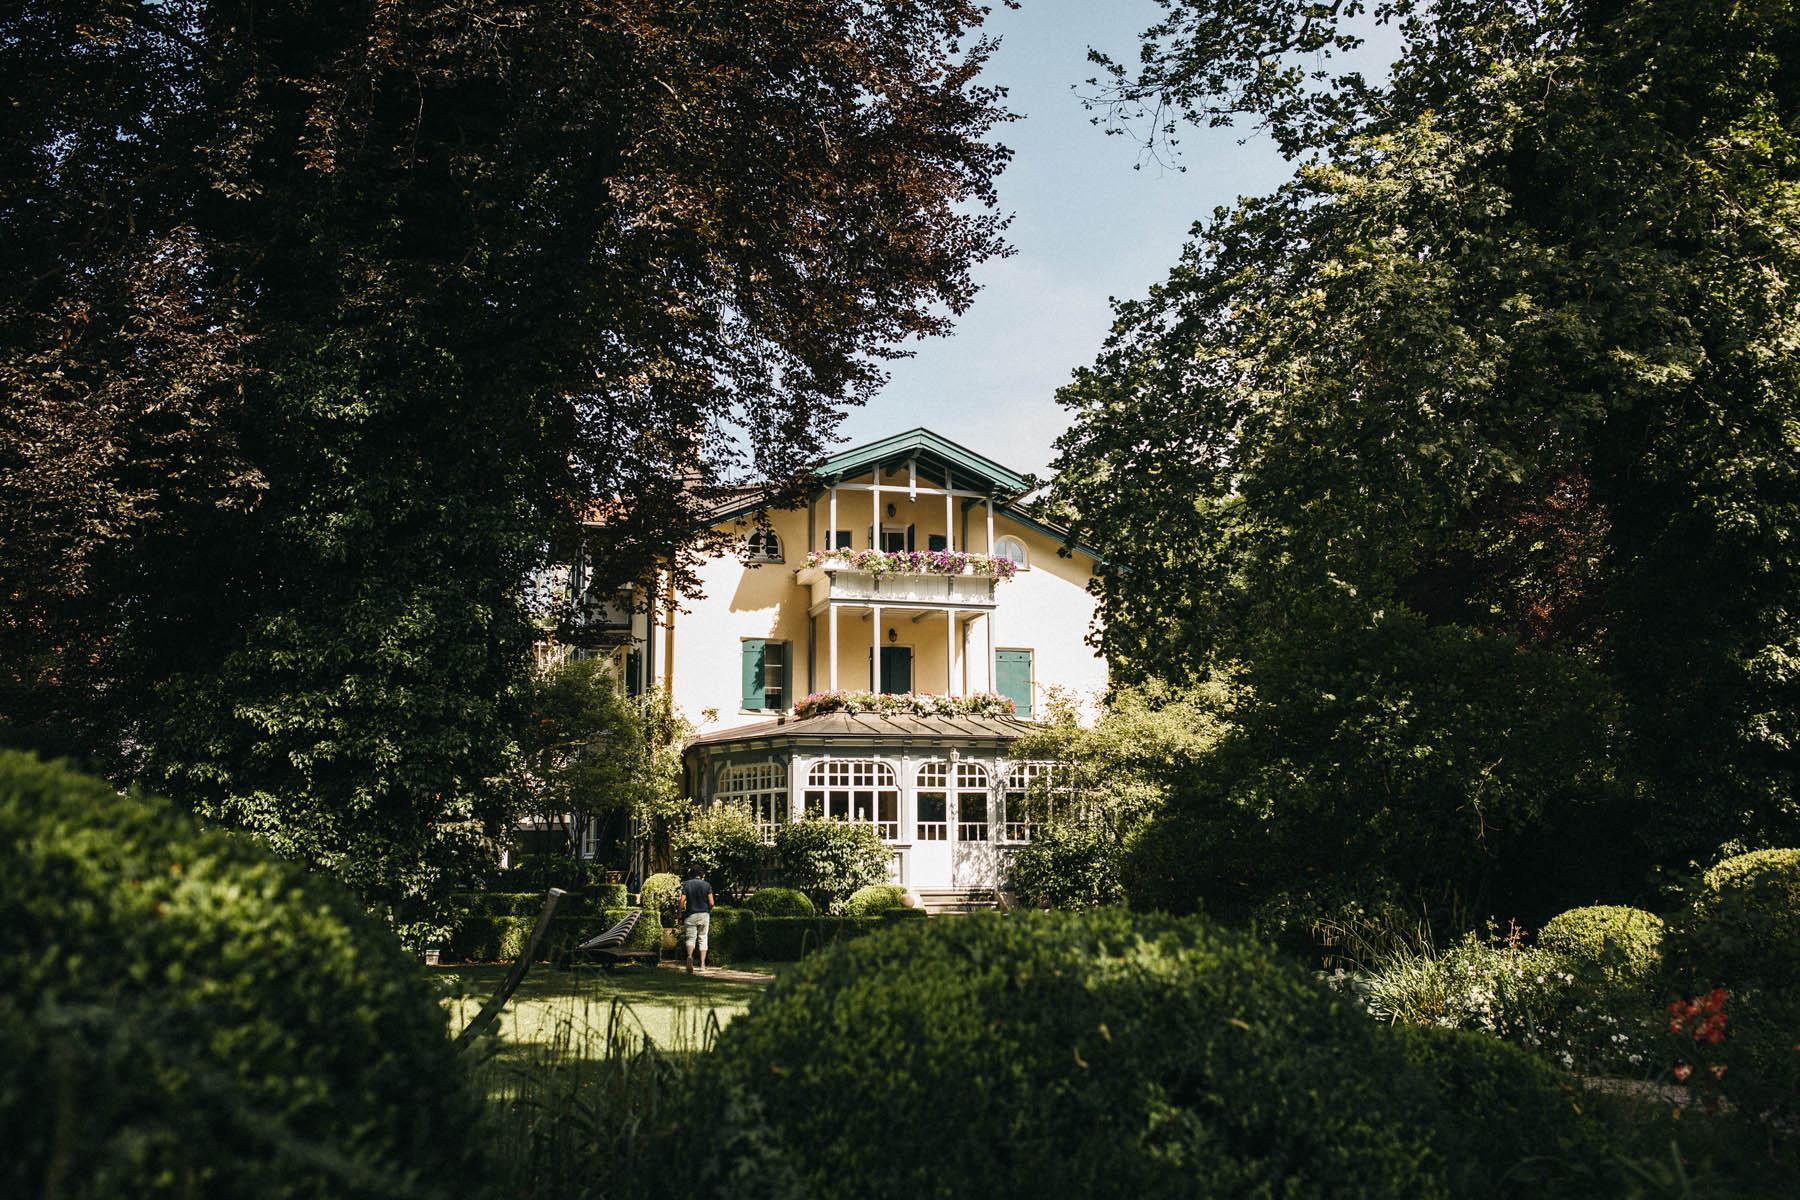 raissa simon fotografie hochzeit vintage starnberger see la villa 002 - Patricia + Maximilian